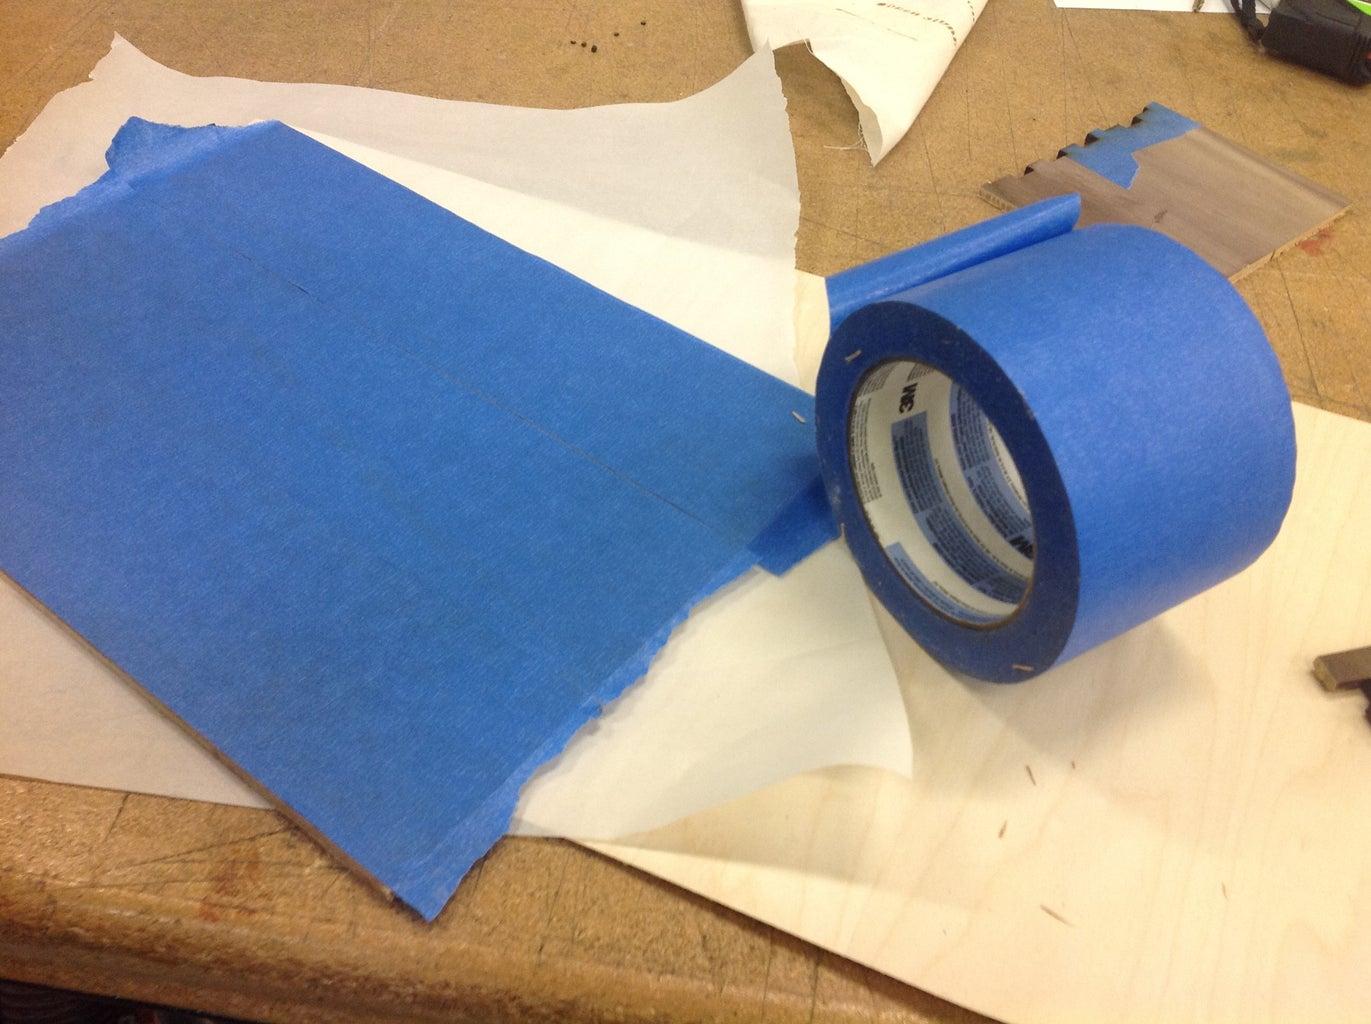 Prep Materials for Laser